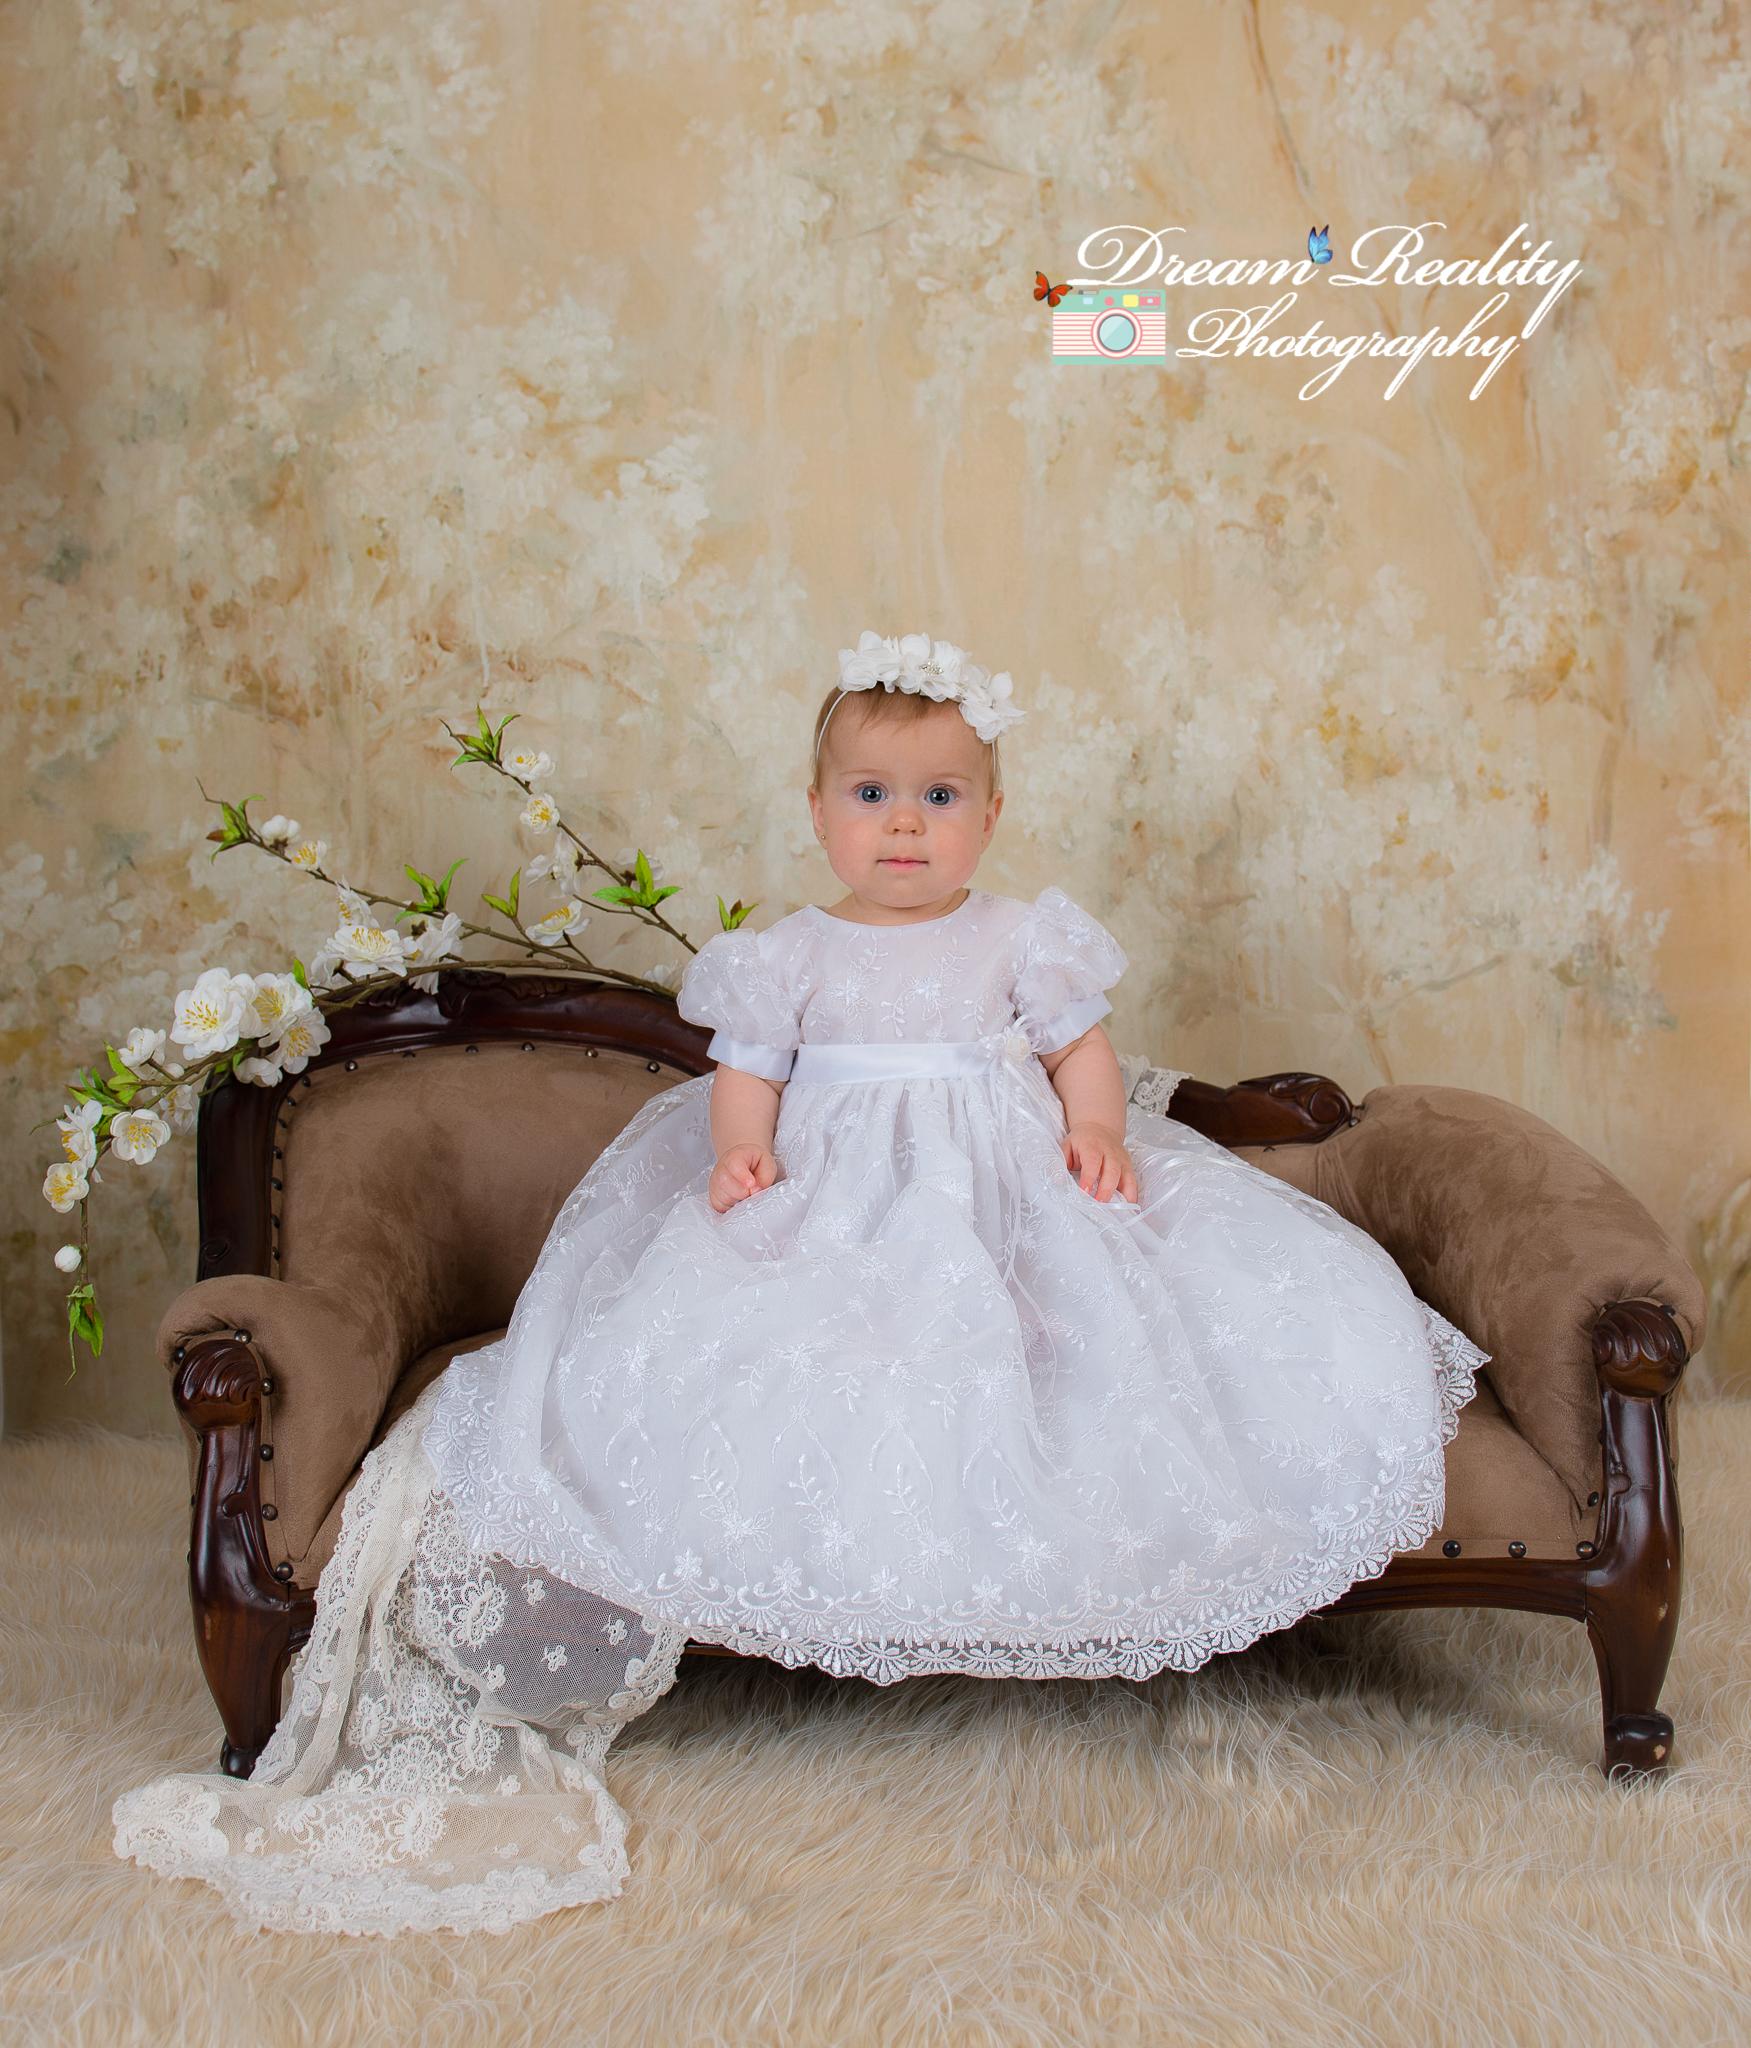 Coloursdekor S Blog: Christianing-girl-Allentown-NJ-8-months-portraits